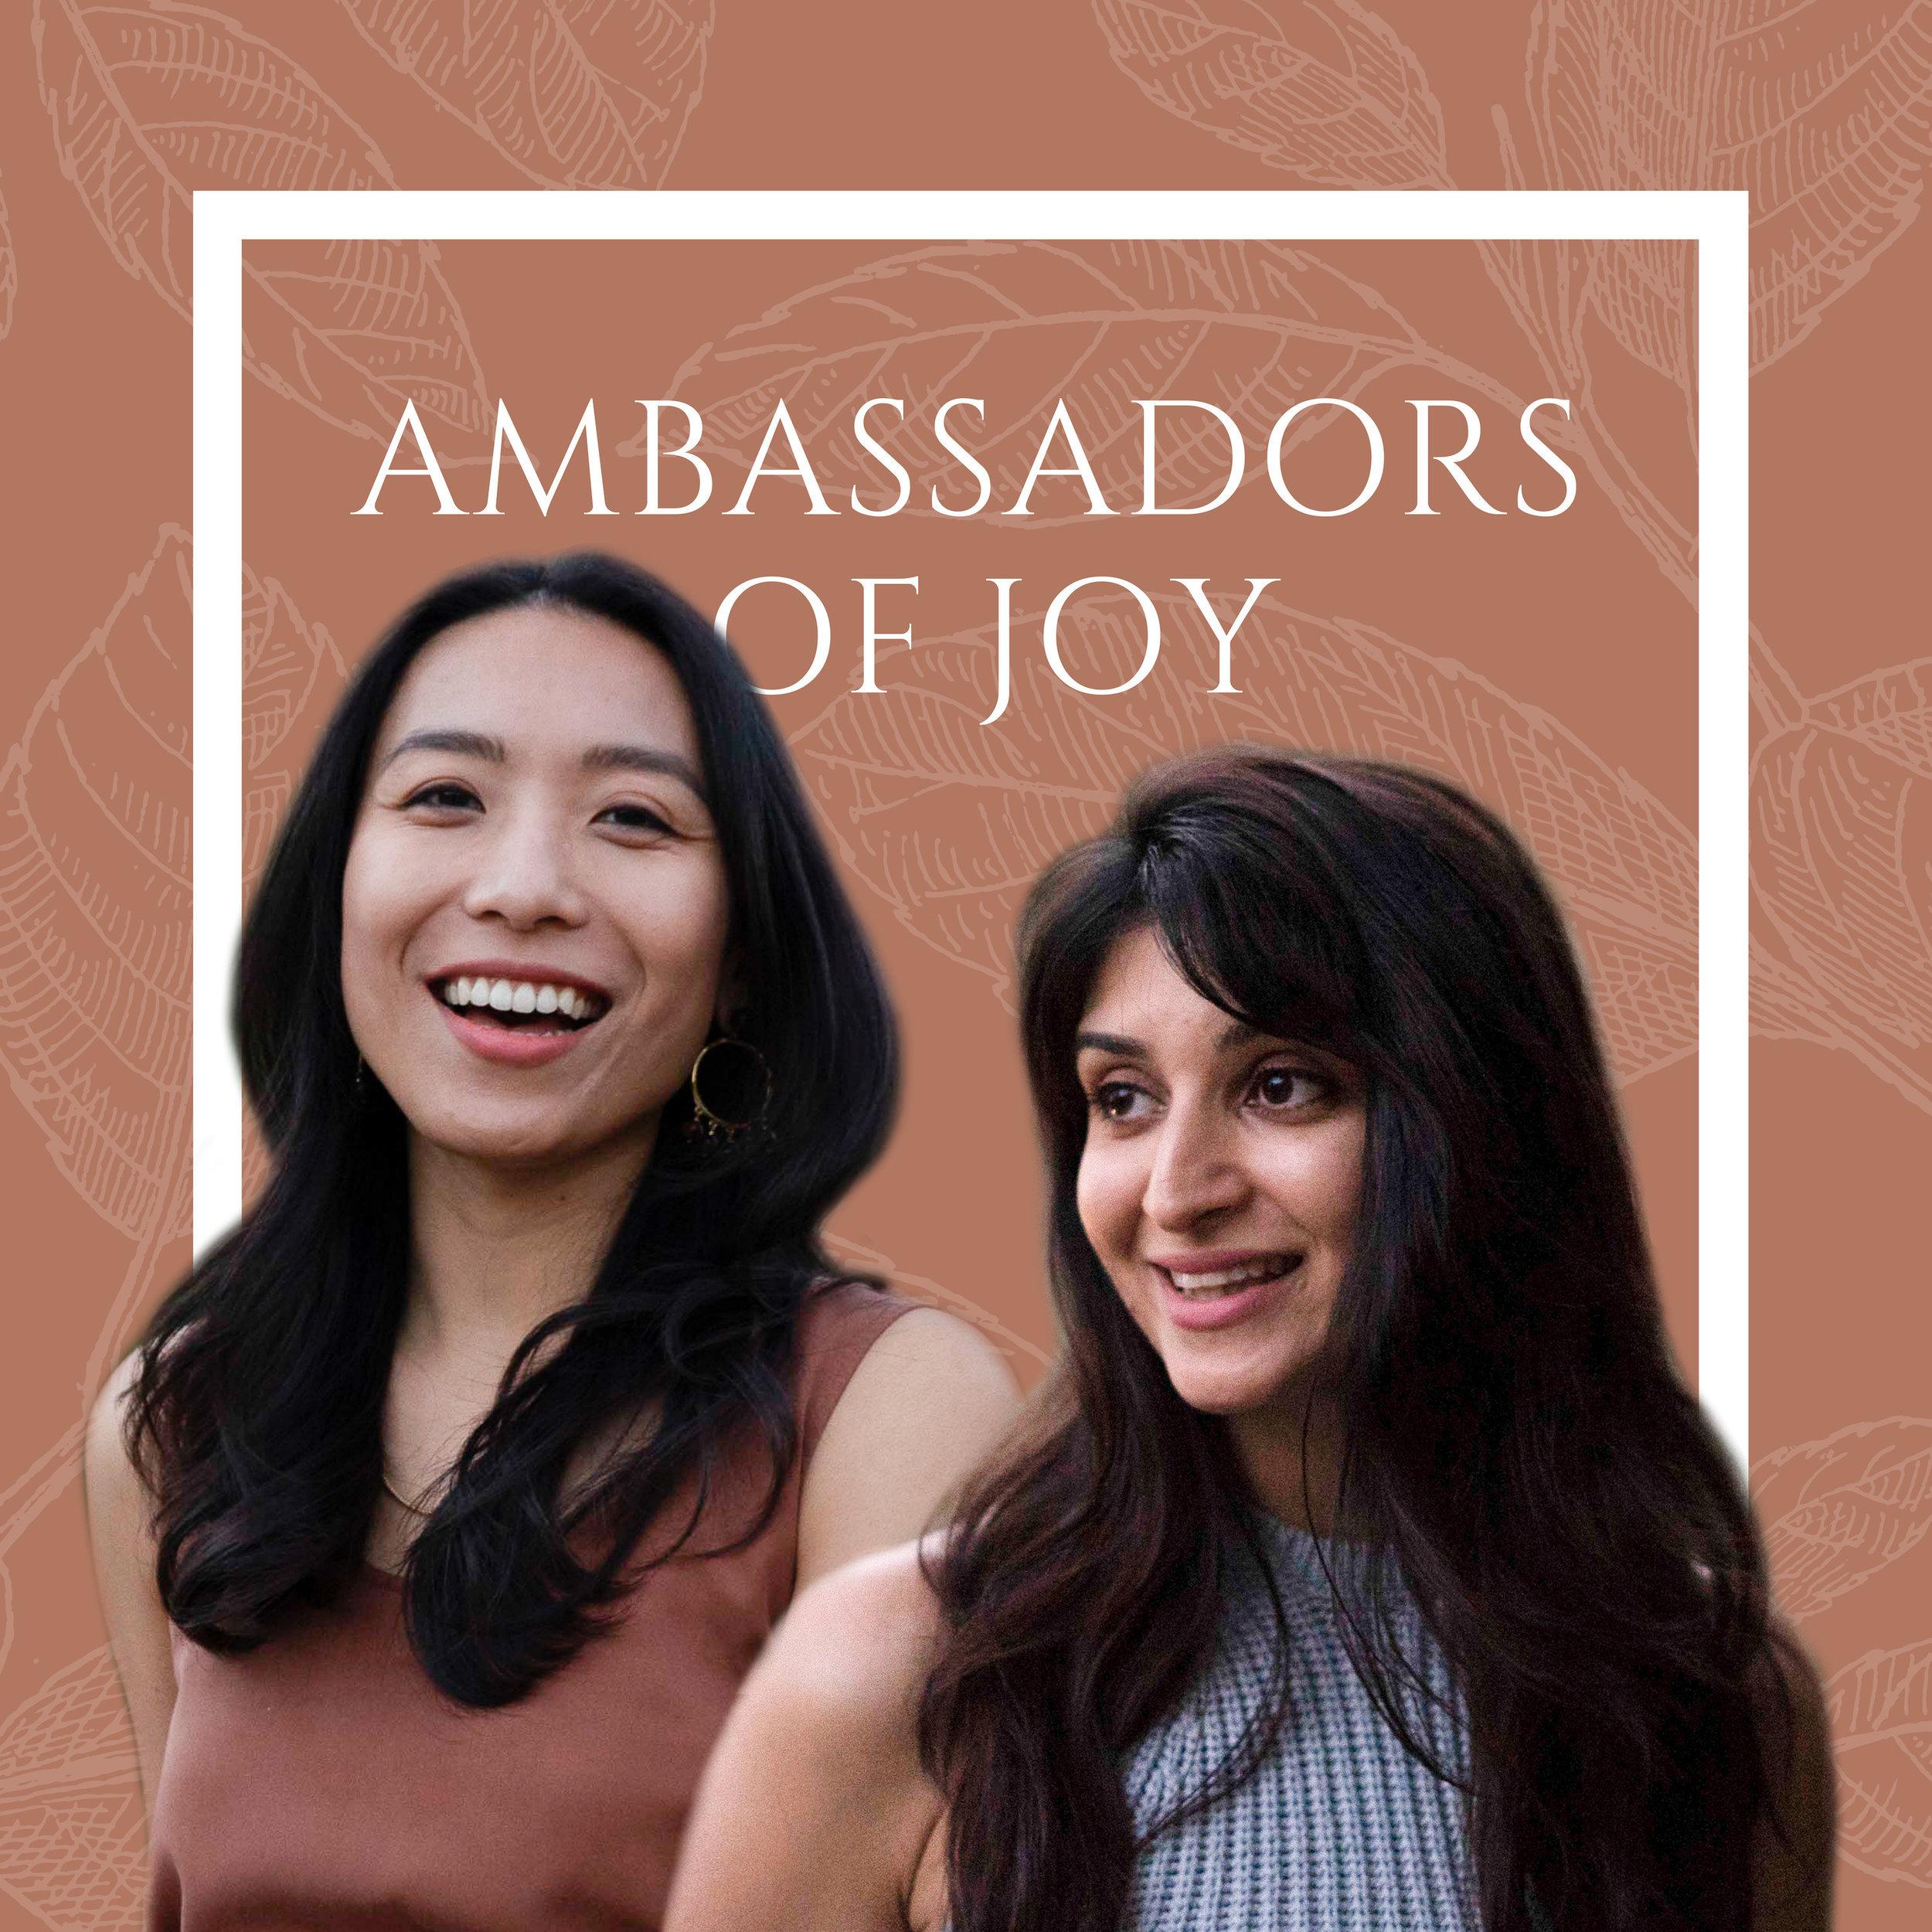 Ambassadors1540935239-artwork.jpg